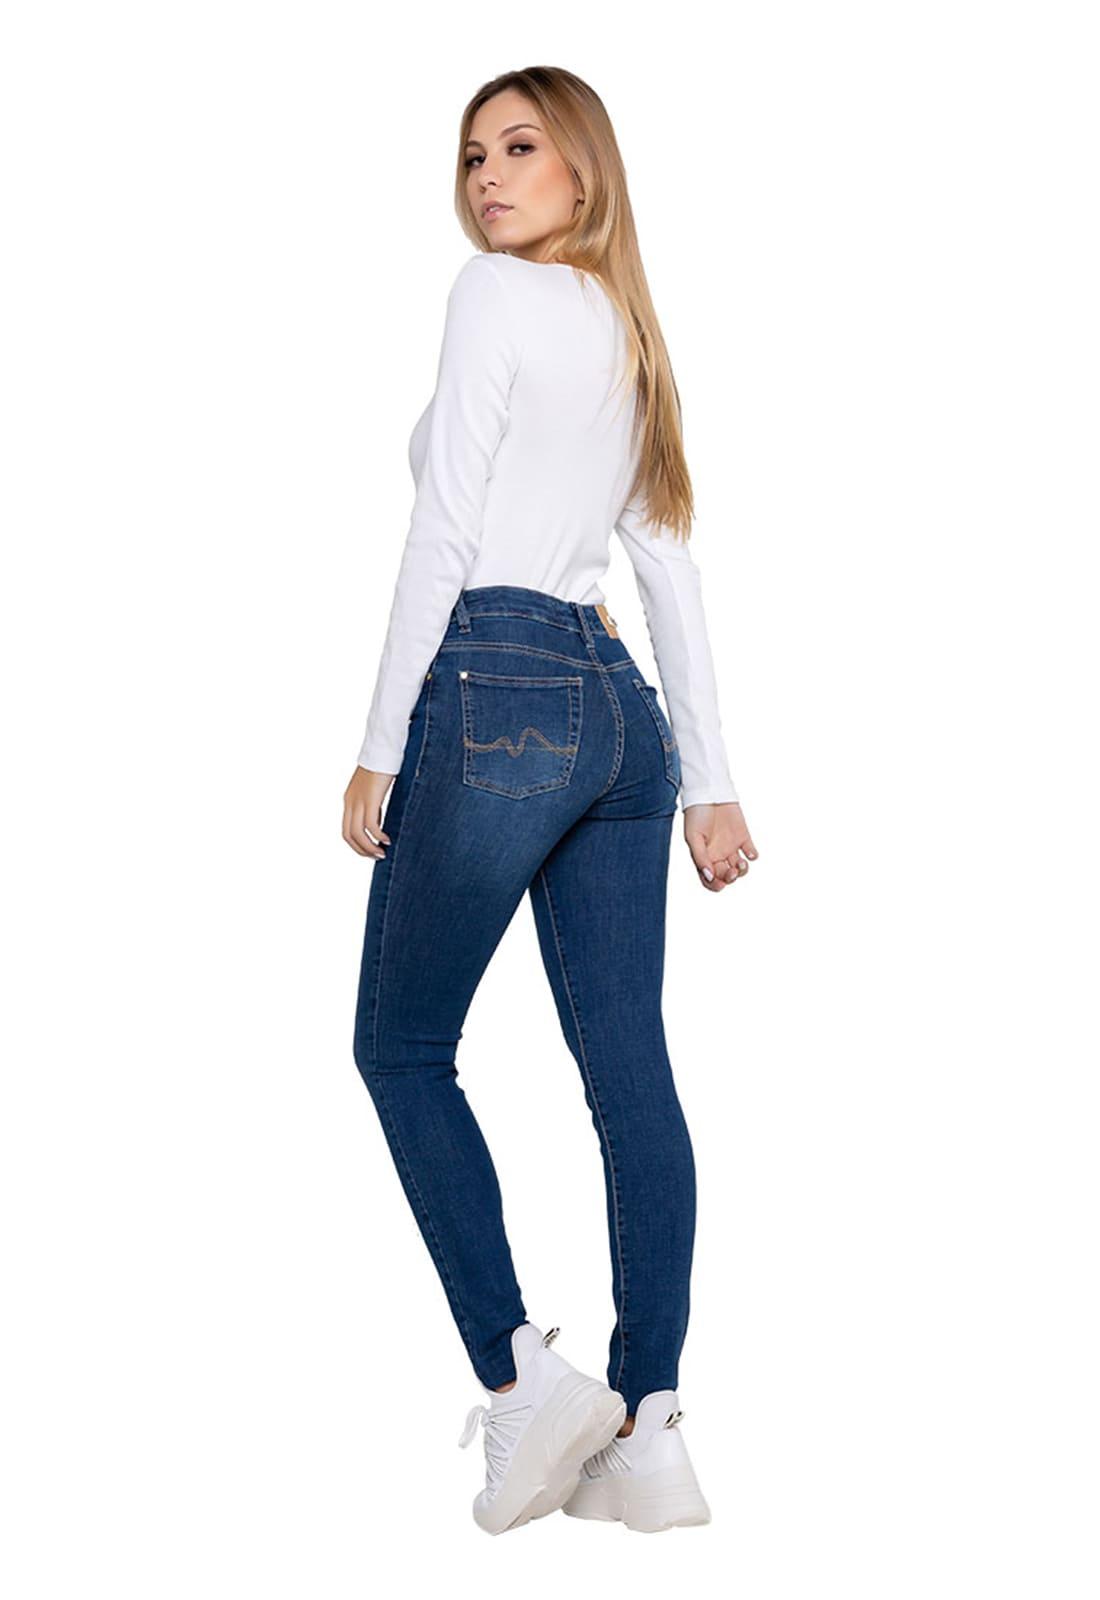 Calça Tradicional Feminina Jeans Skinny